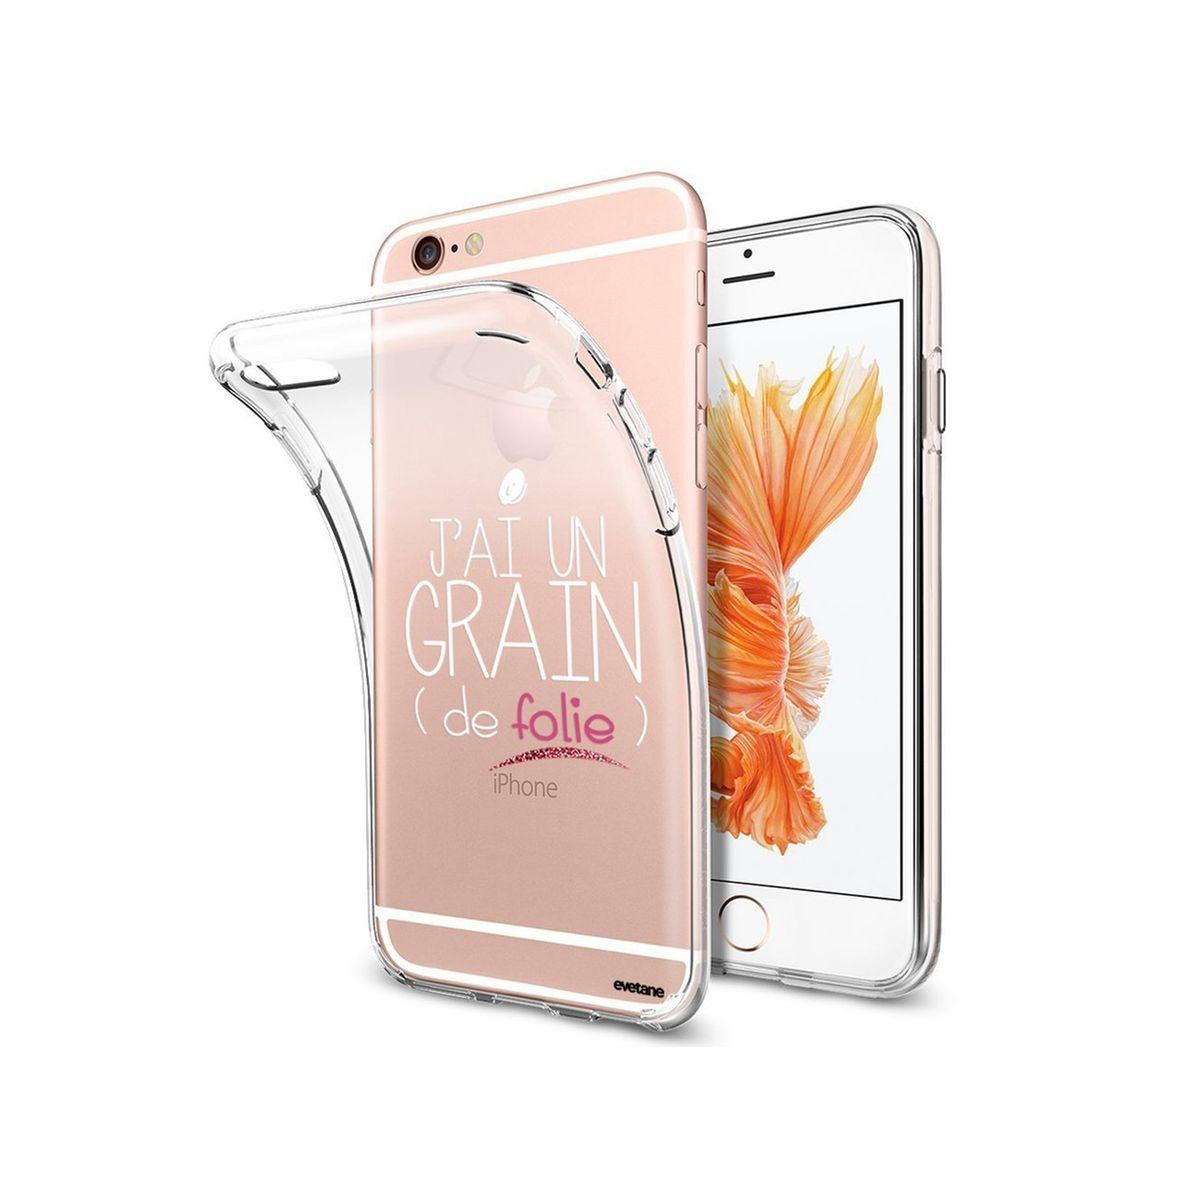 Coque iPhone 6 Plus / 6S Plus souple transparente, Grain De Folie, Evetane®